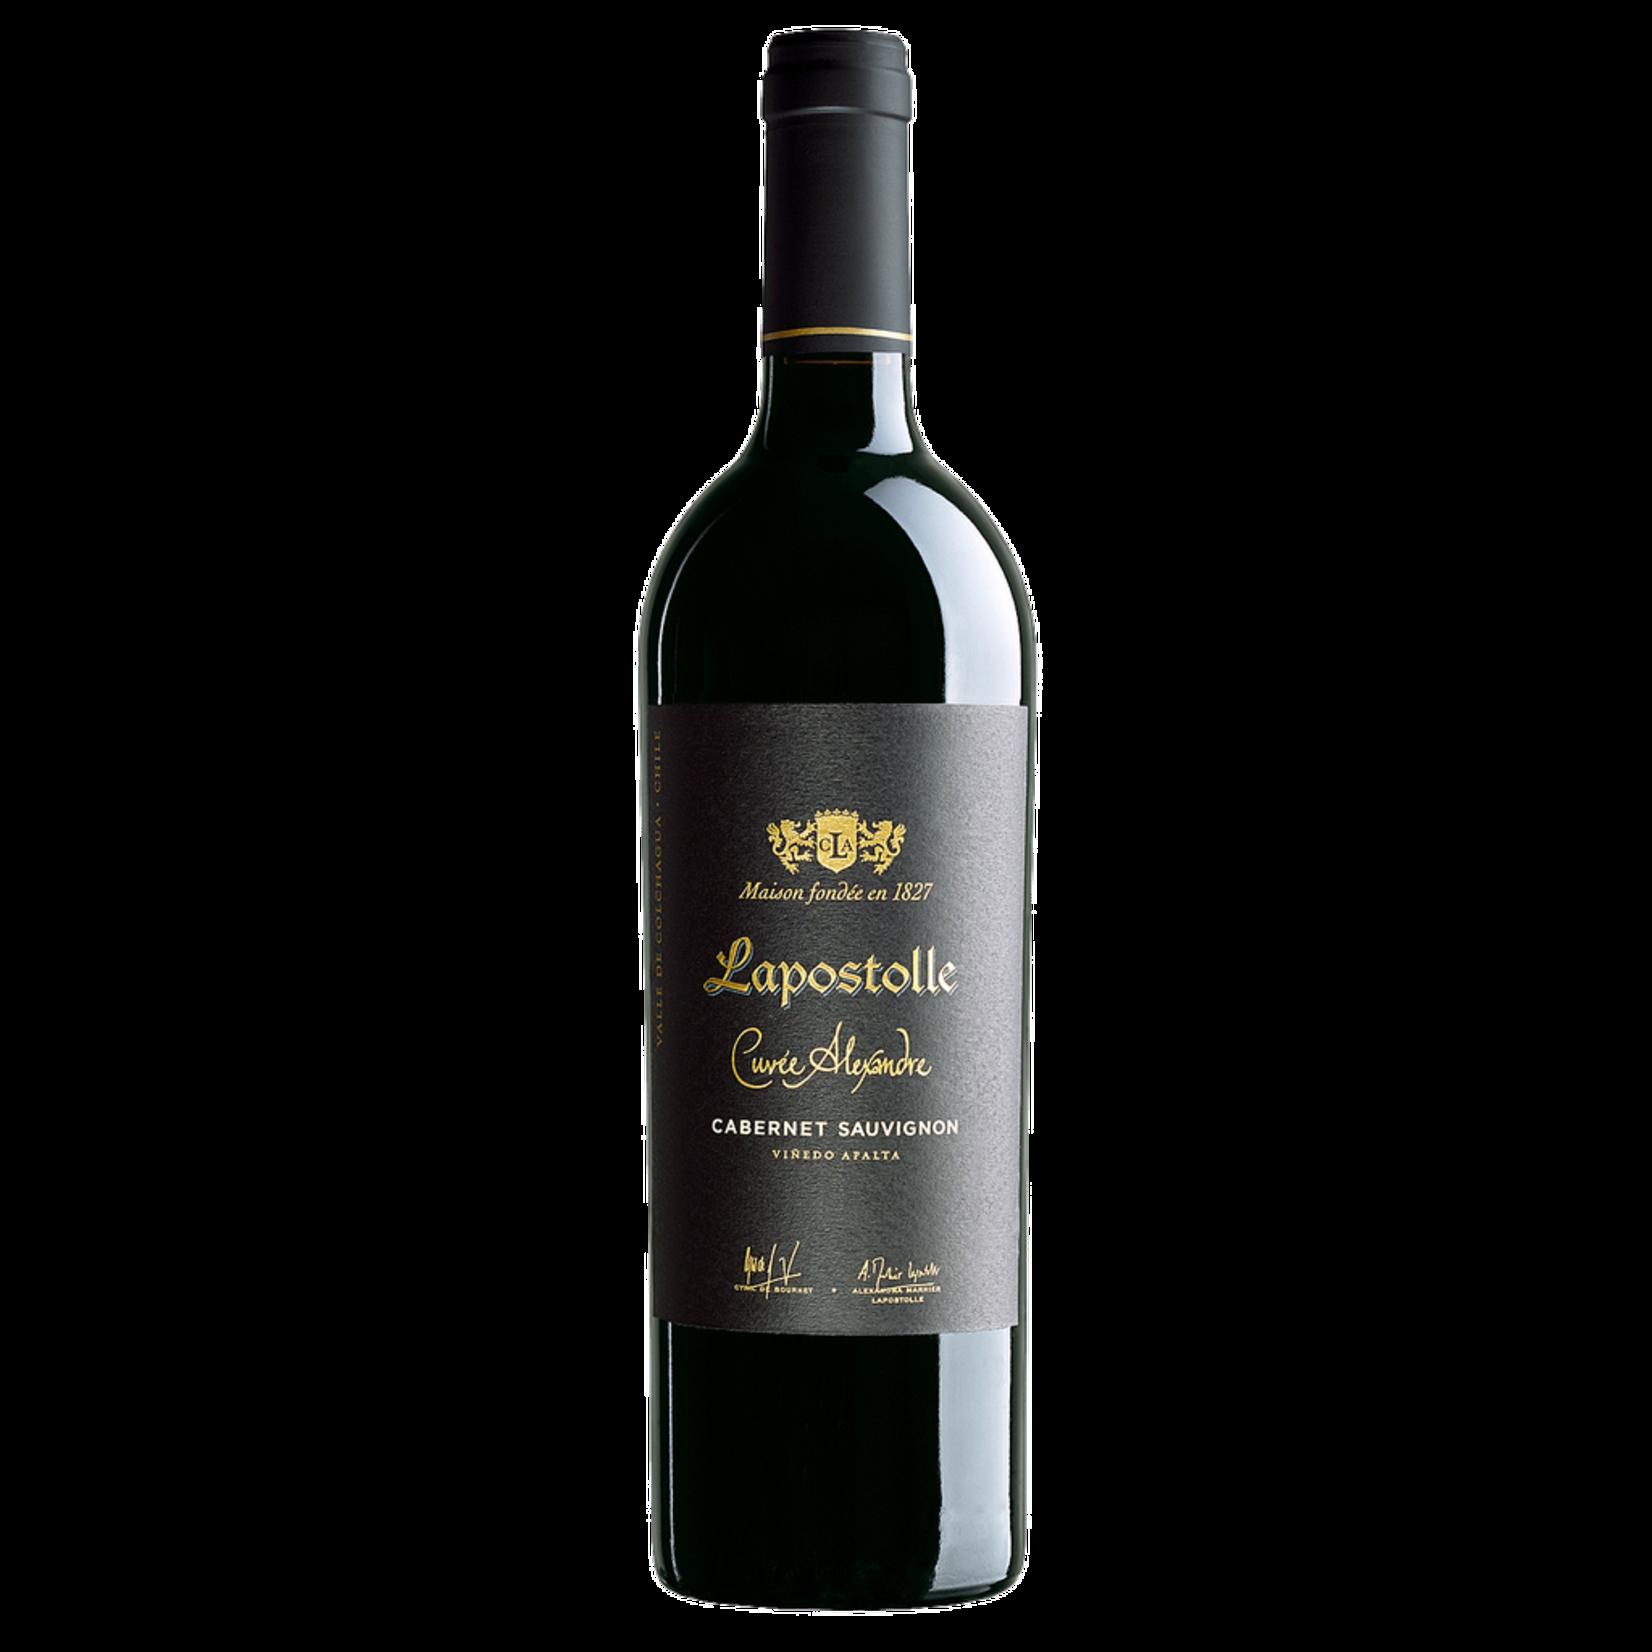 Wine Lapostolle Cuvee Alexandre Cabernet Sauvignon Apalta Vineyard Valle del Colchagua 2018